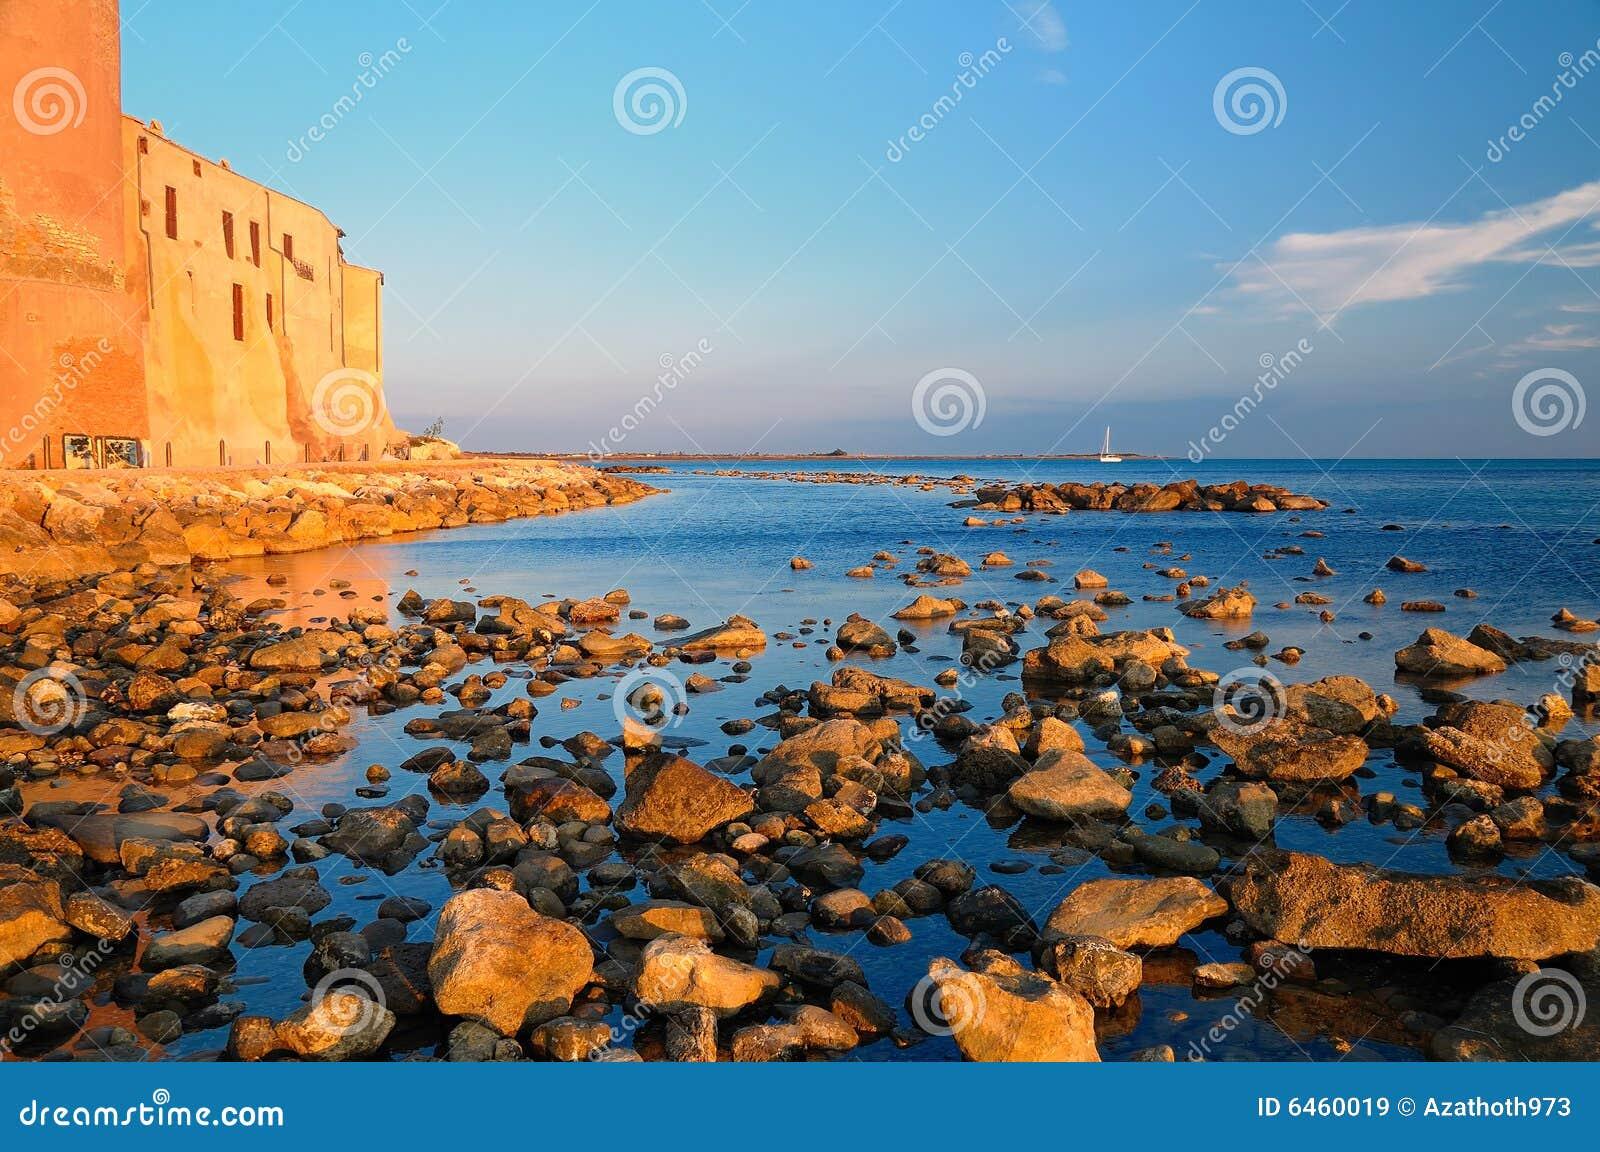 Nad morze krajobrazu